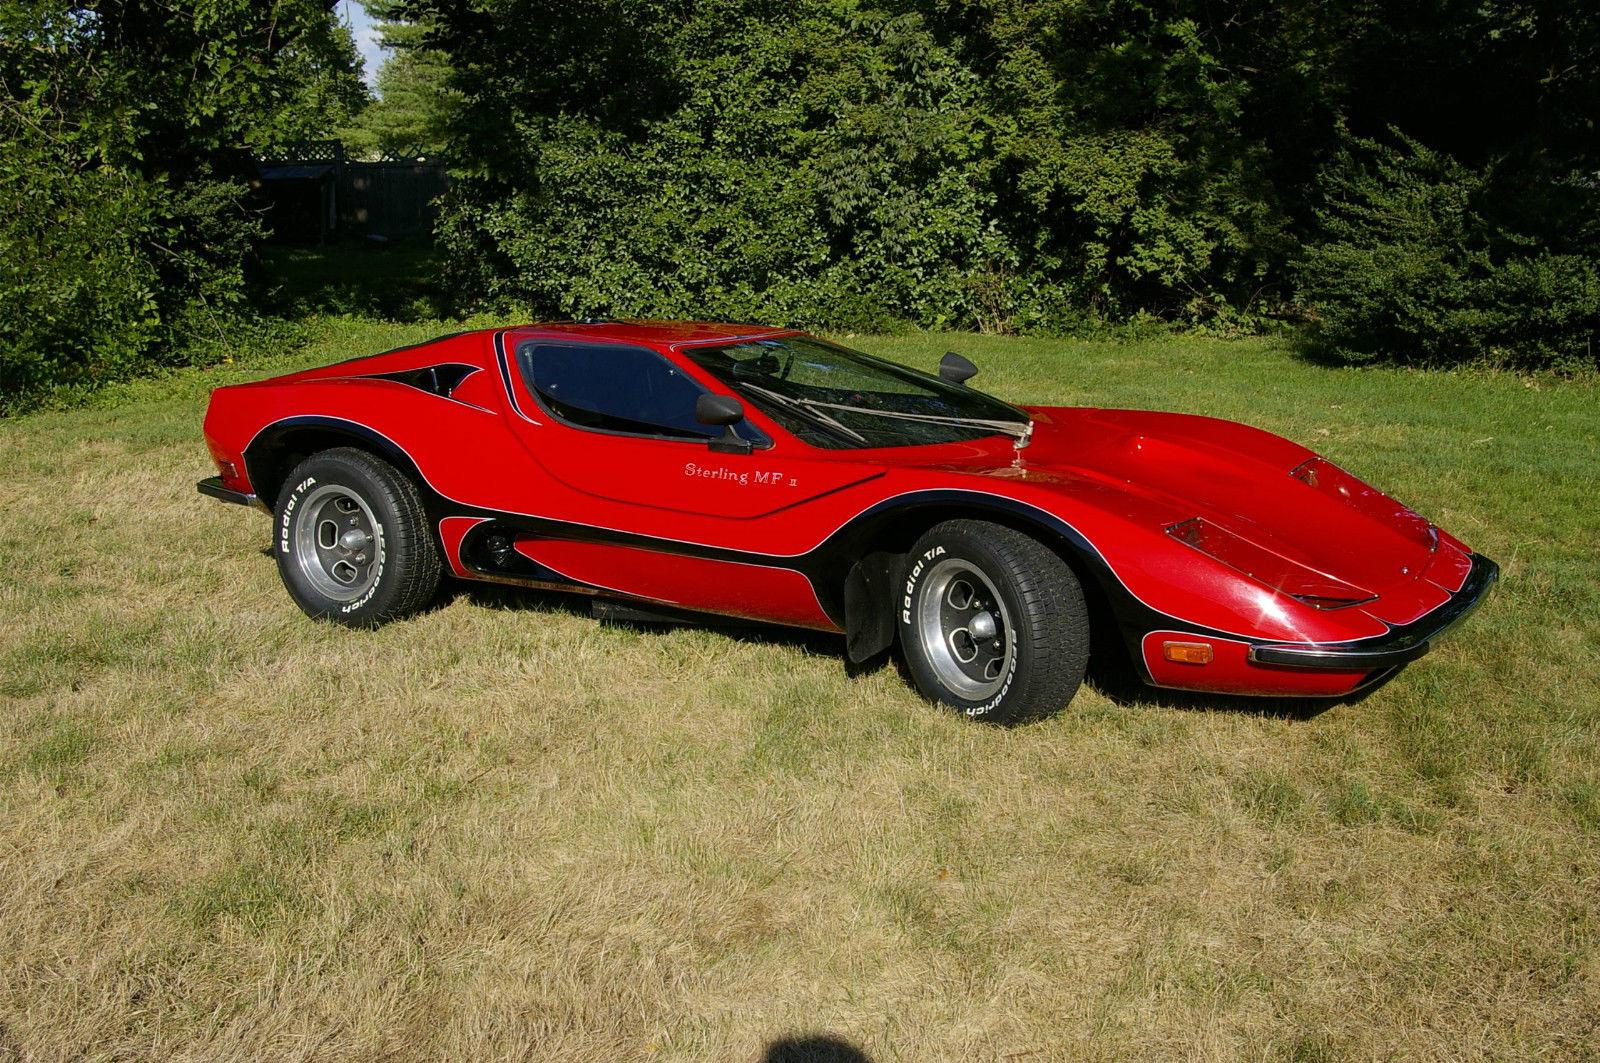 Factory built sterling kit car for sale on ebay for Motor cars for sale